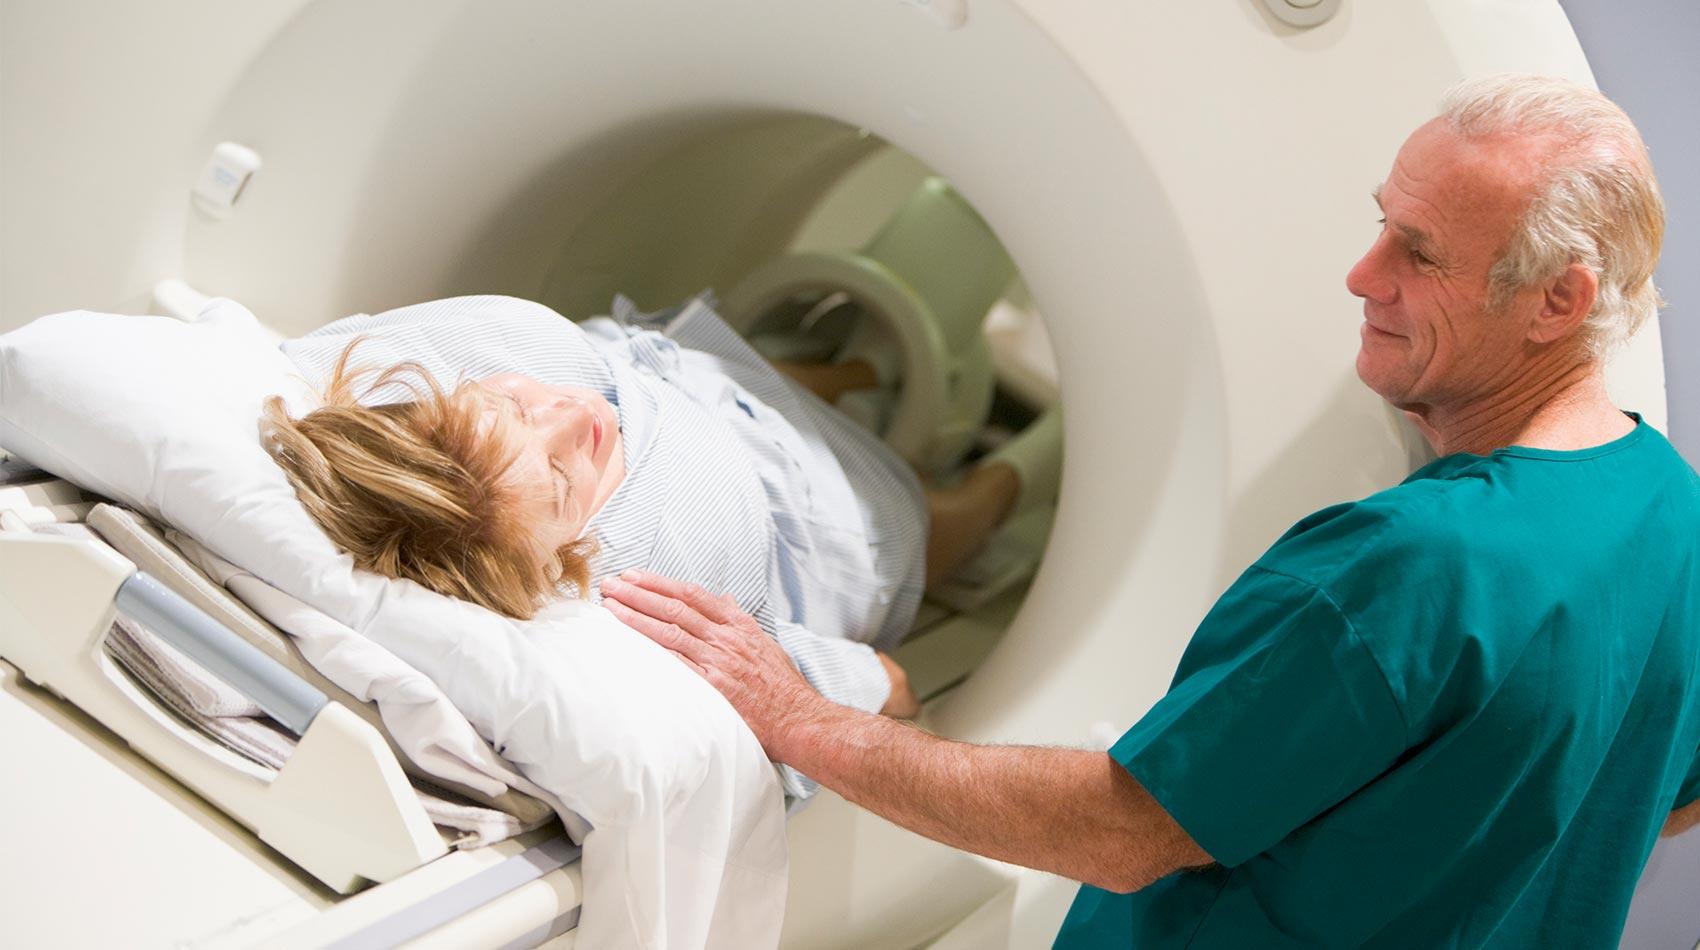 Radiology Technologist